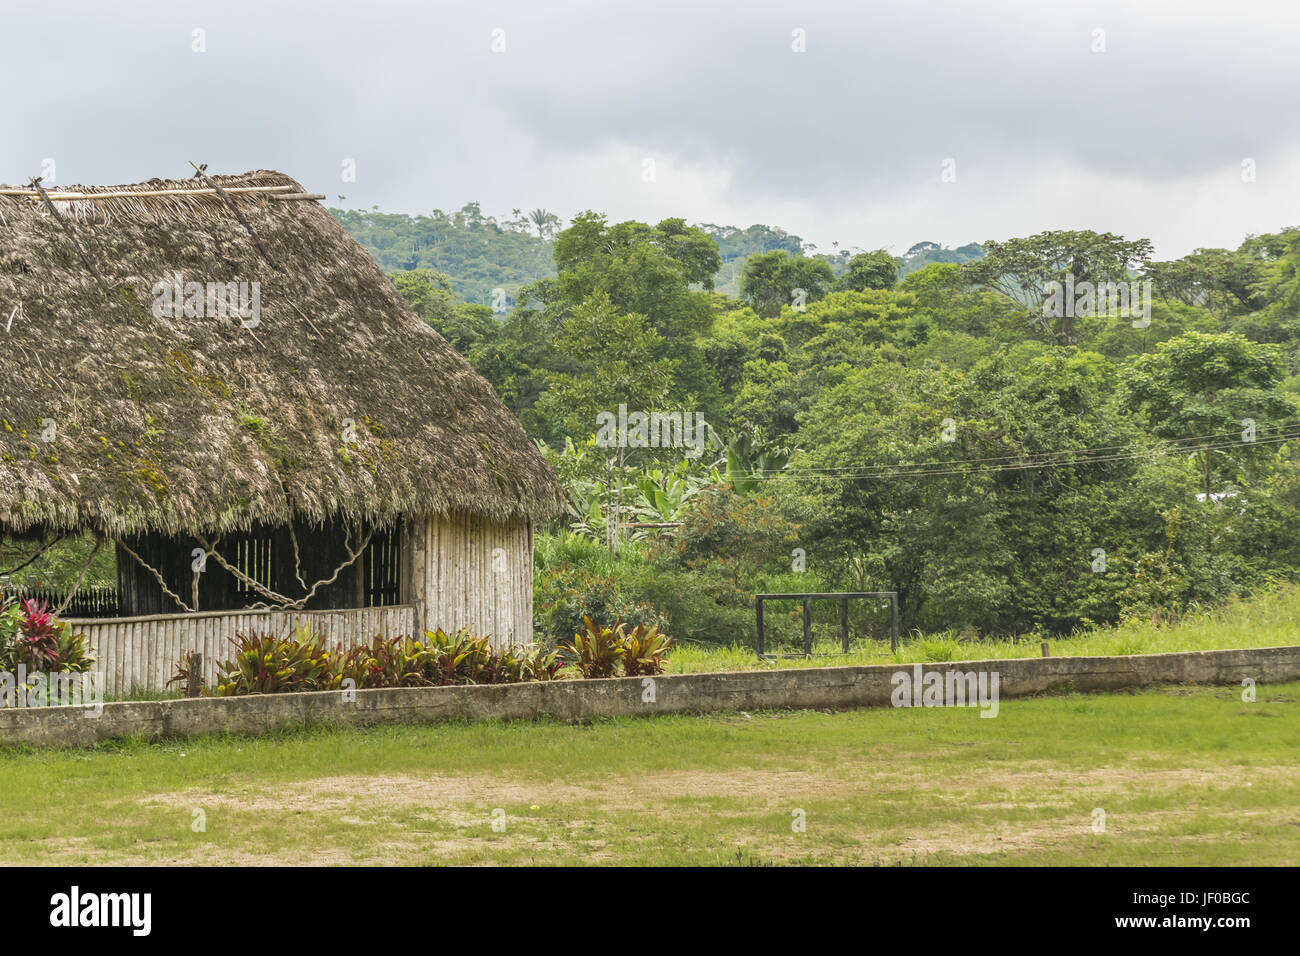 Amazonia Scene in Puyo Ecuador - Stock Image